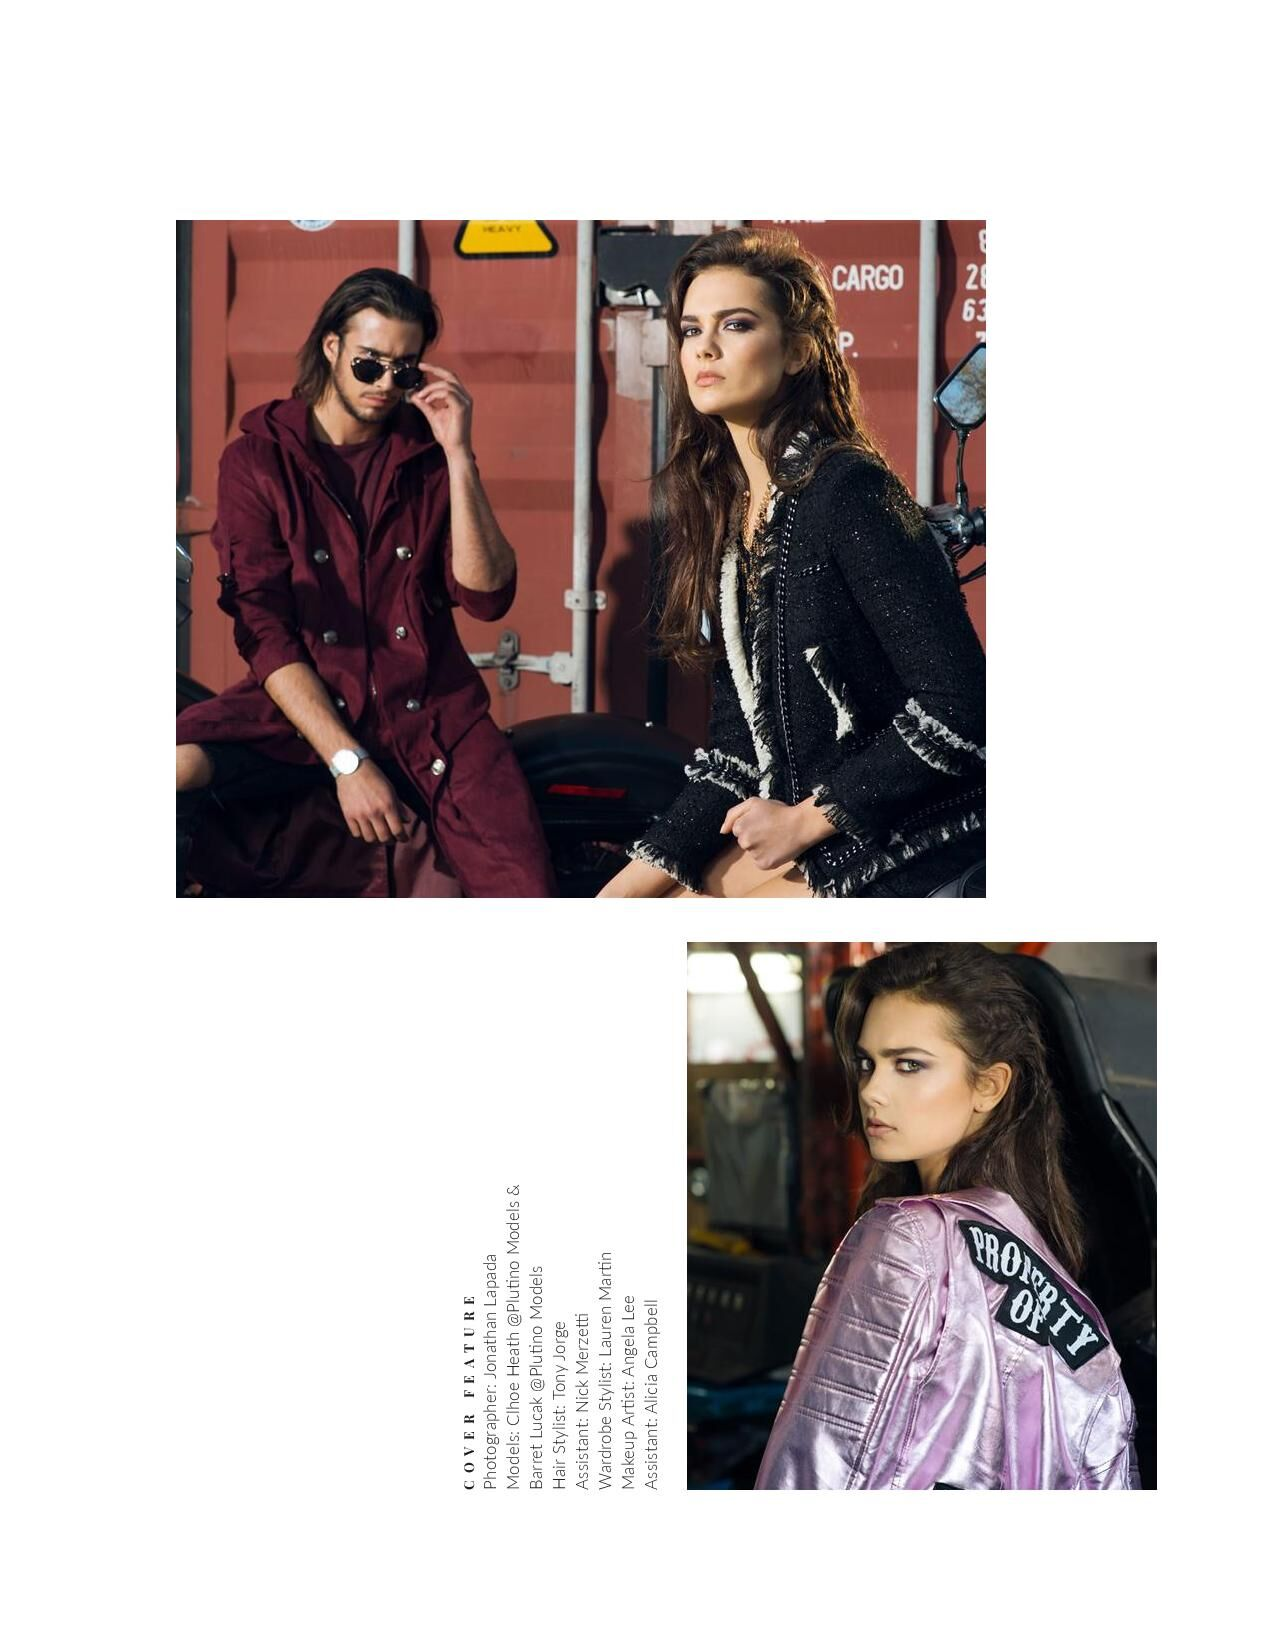 February_2018_Fashion_8_February_2018_-page-002_preview.jpeg